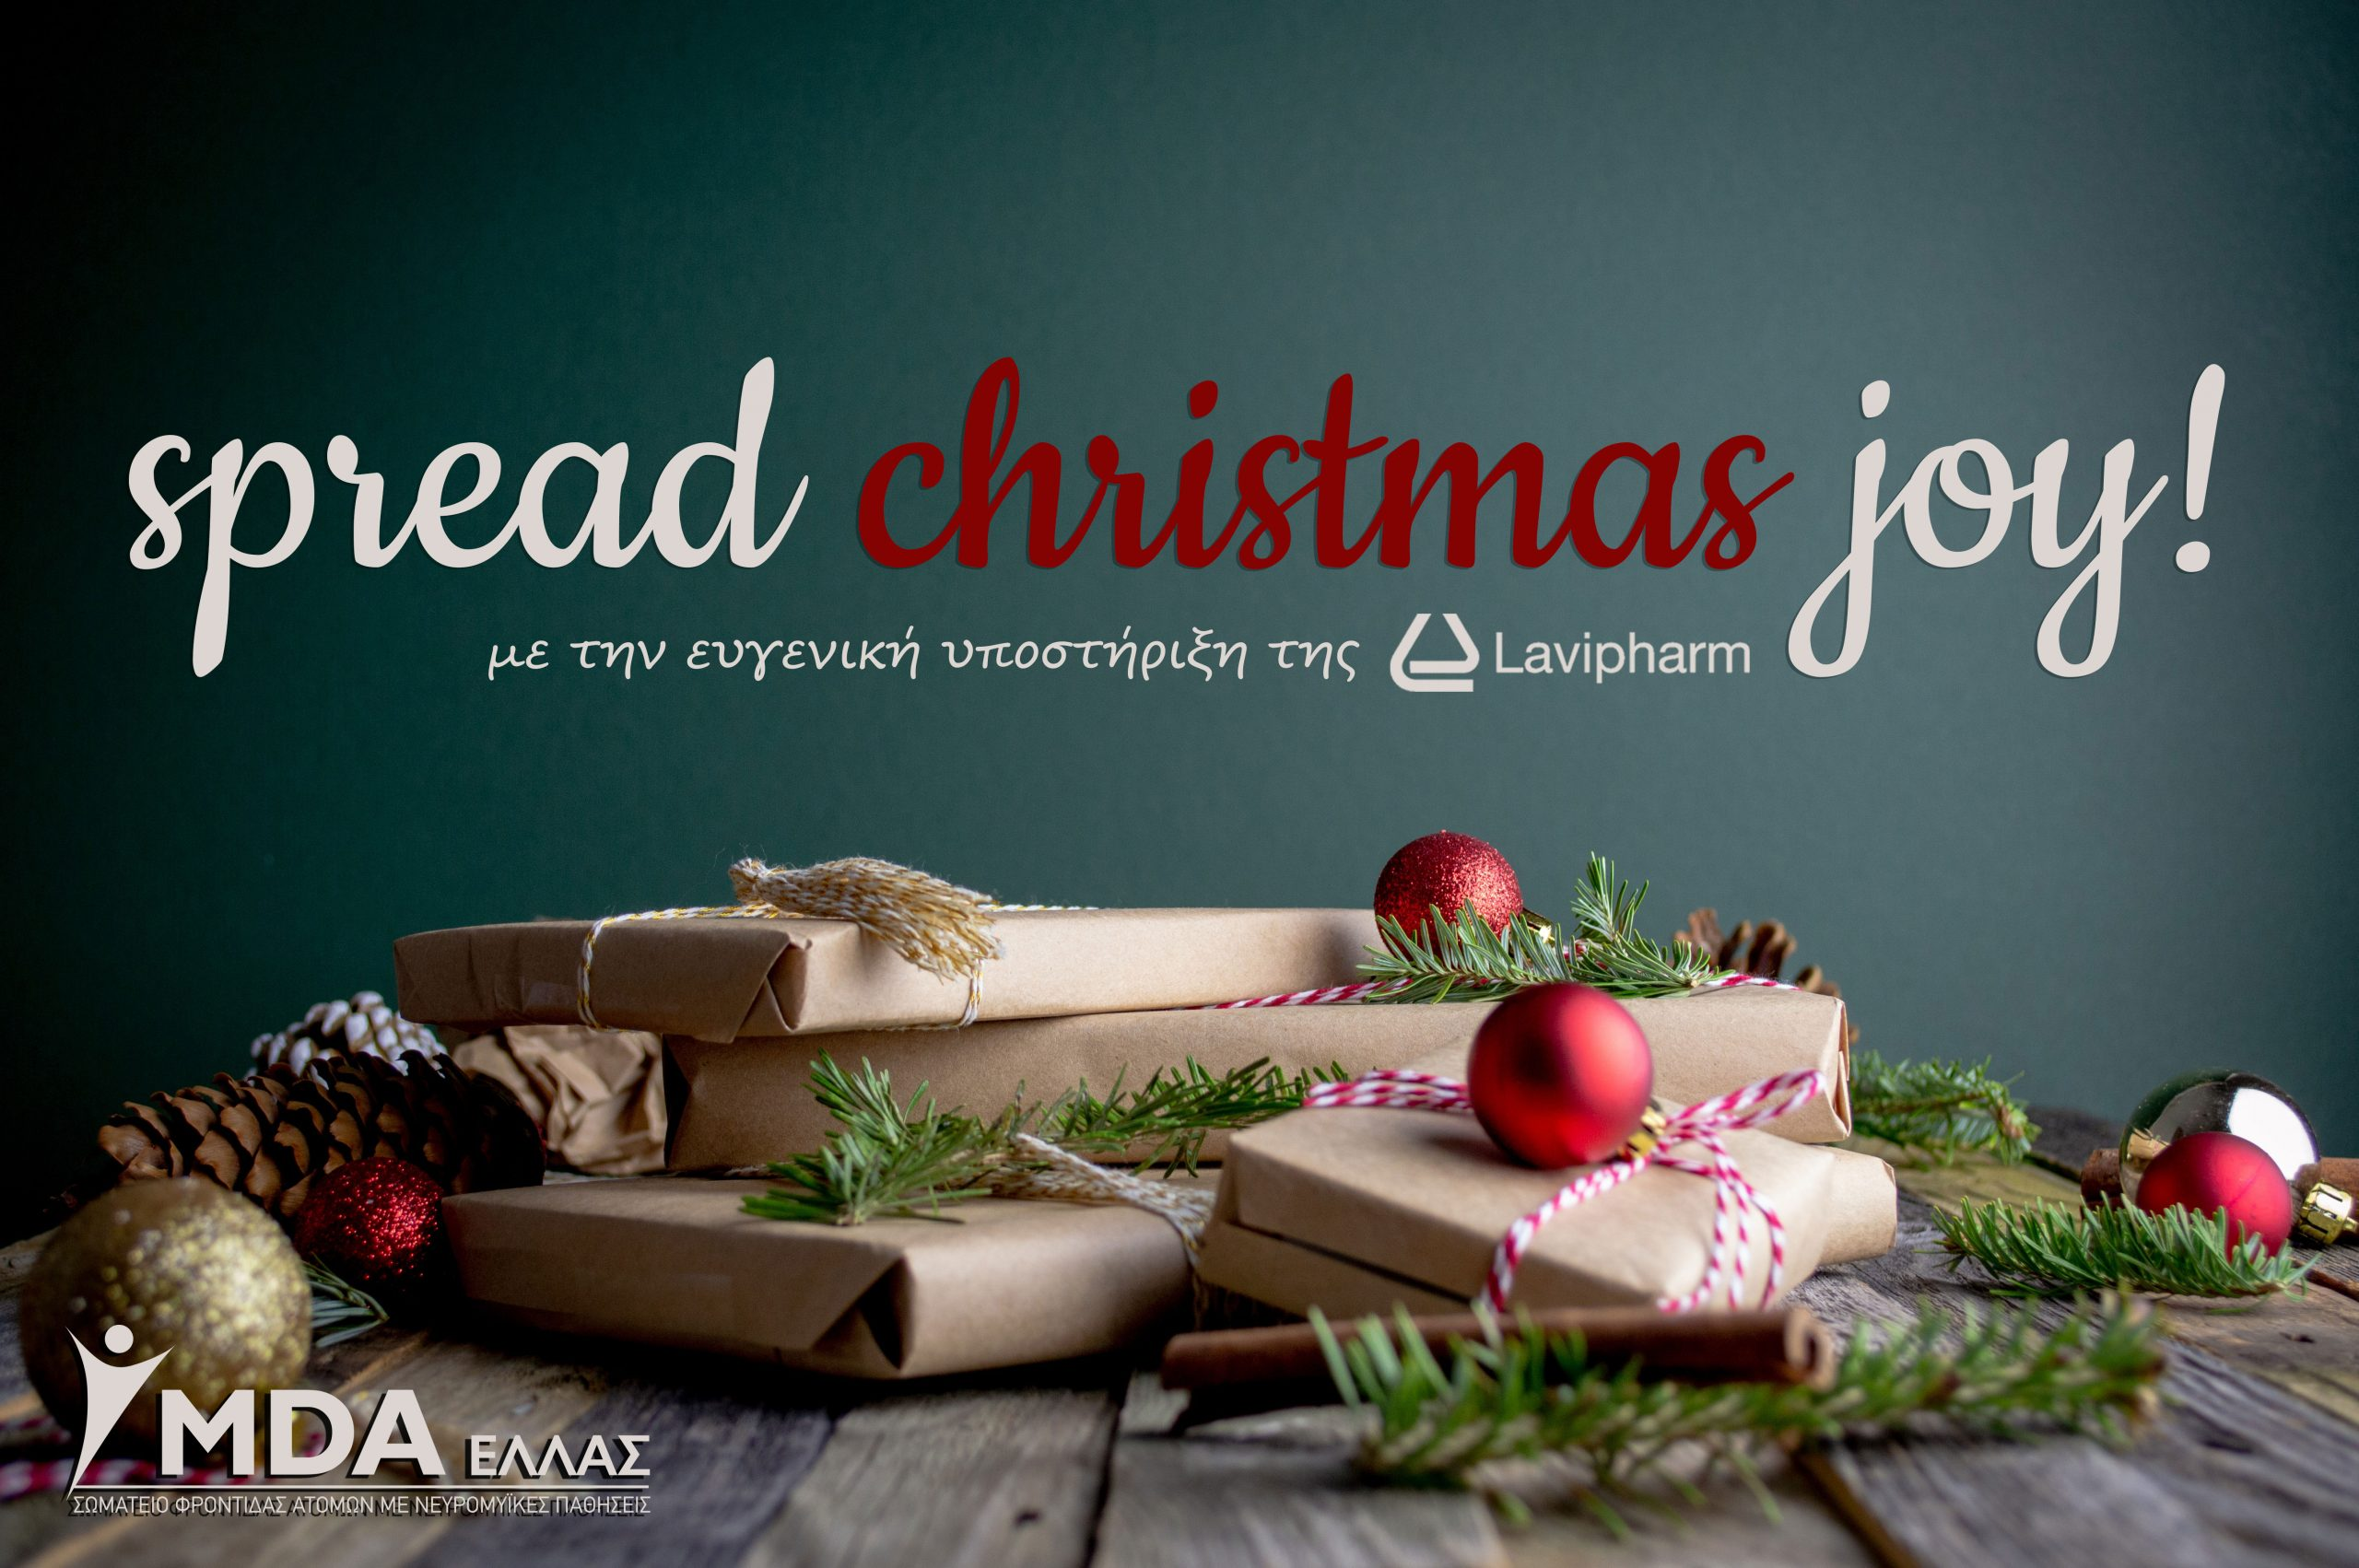 Lavipharm: Υποστηρίζει την πρωτοβουλία Spread Christmas Joy του MDA Ελλάς